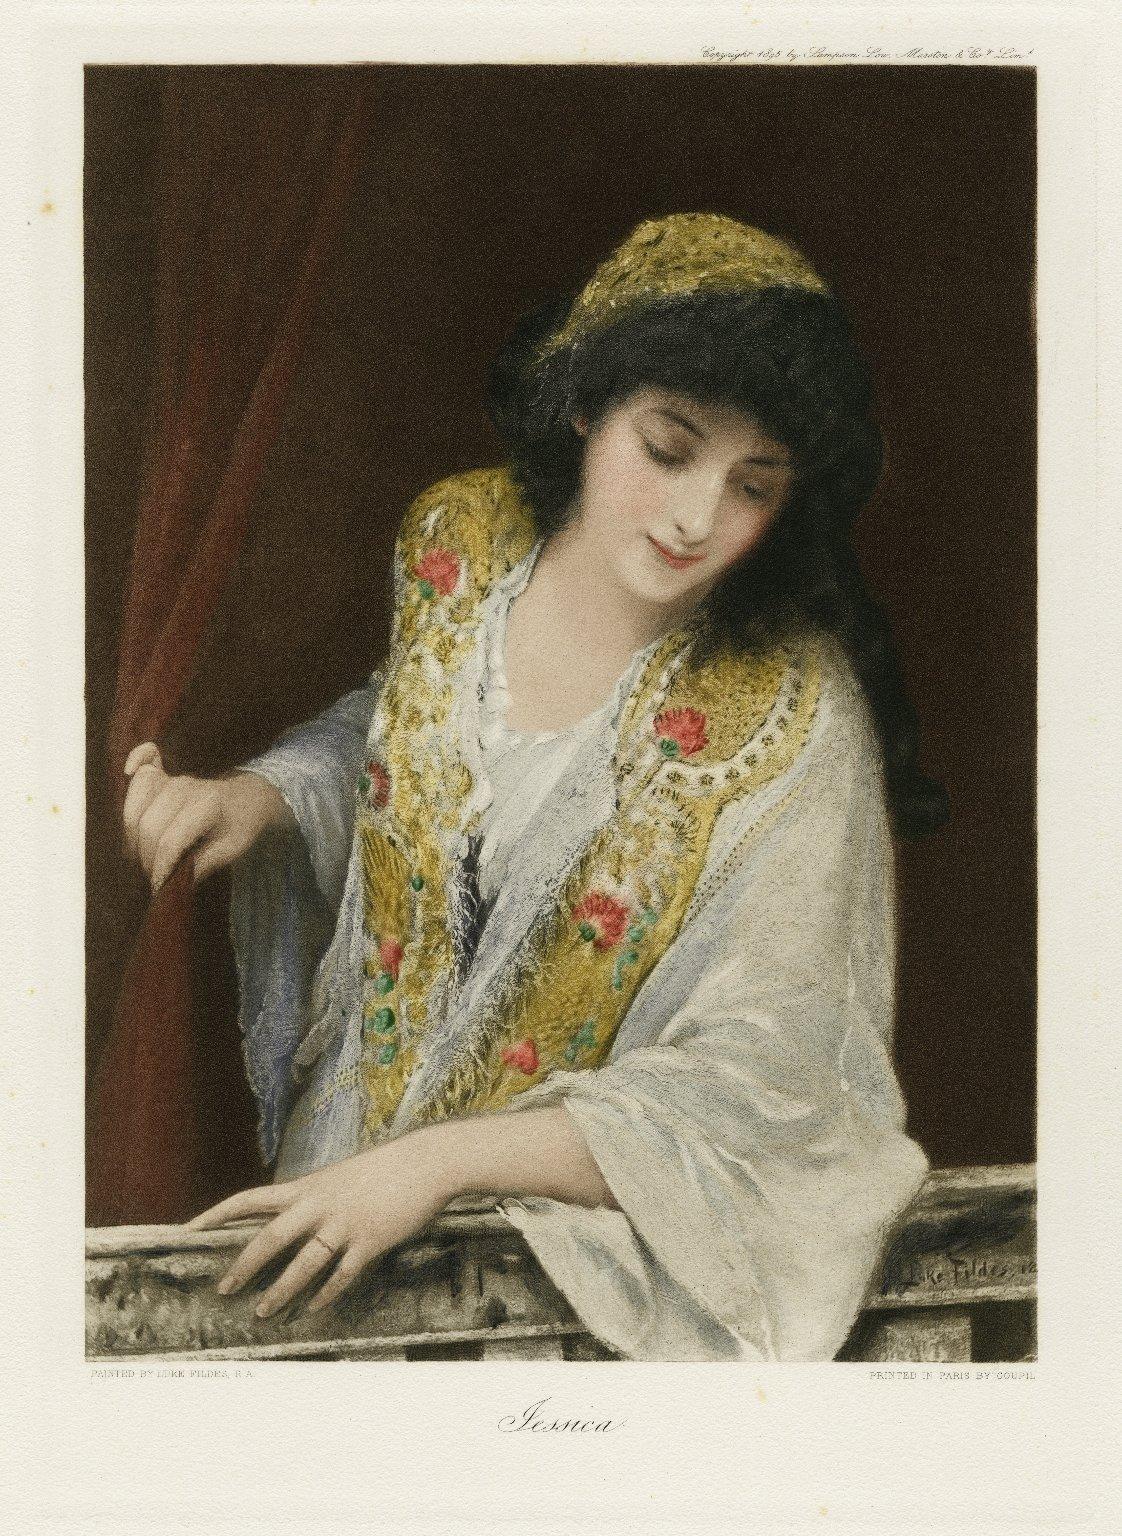 Jessica The Merchant of Venice